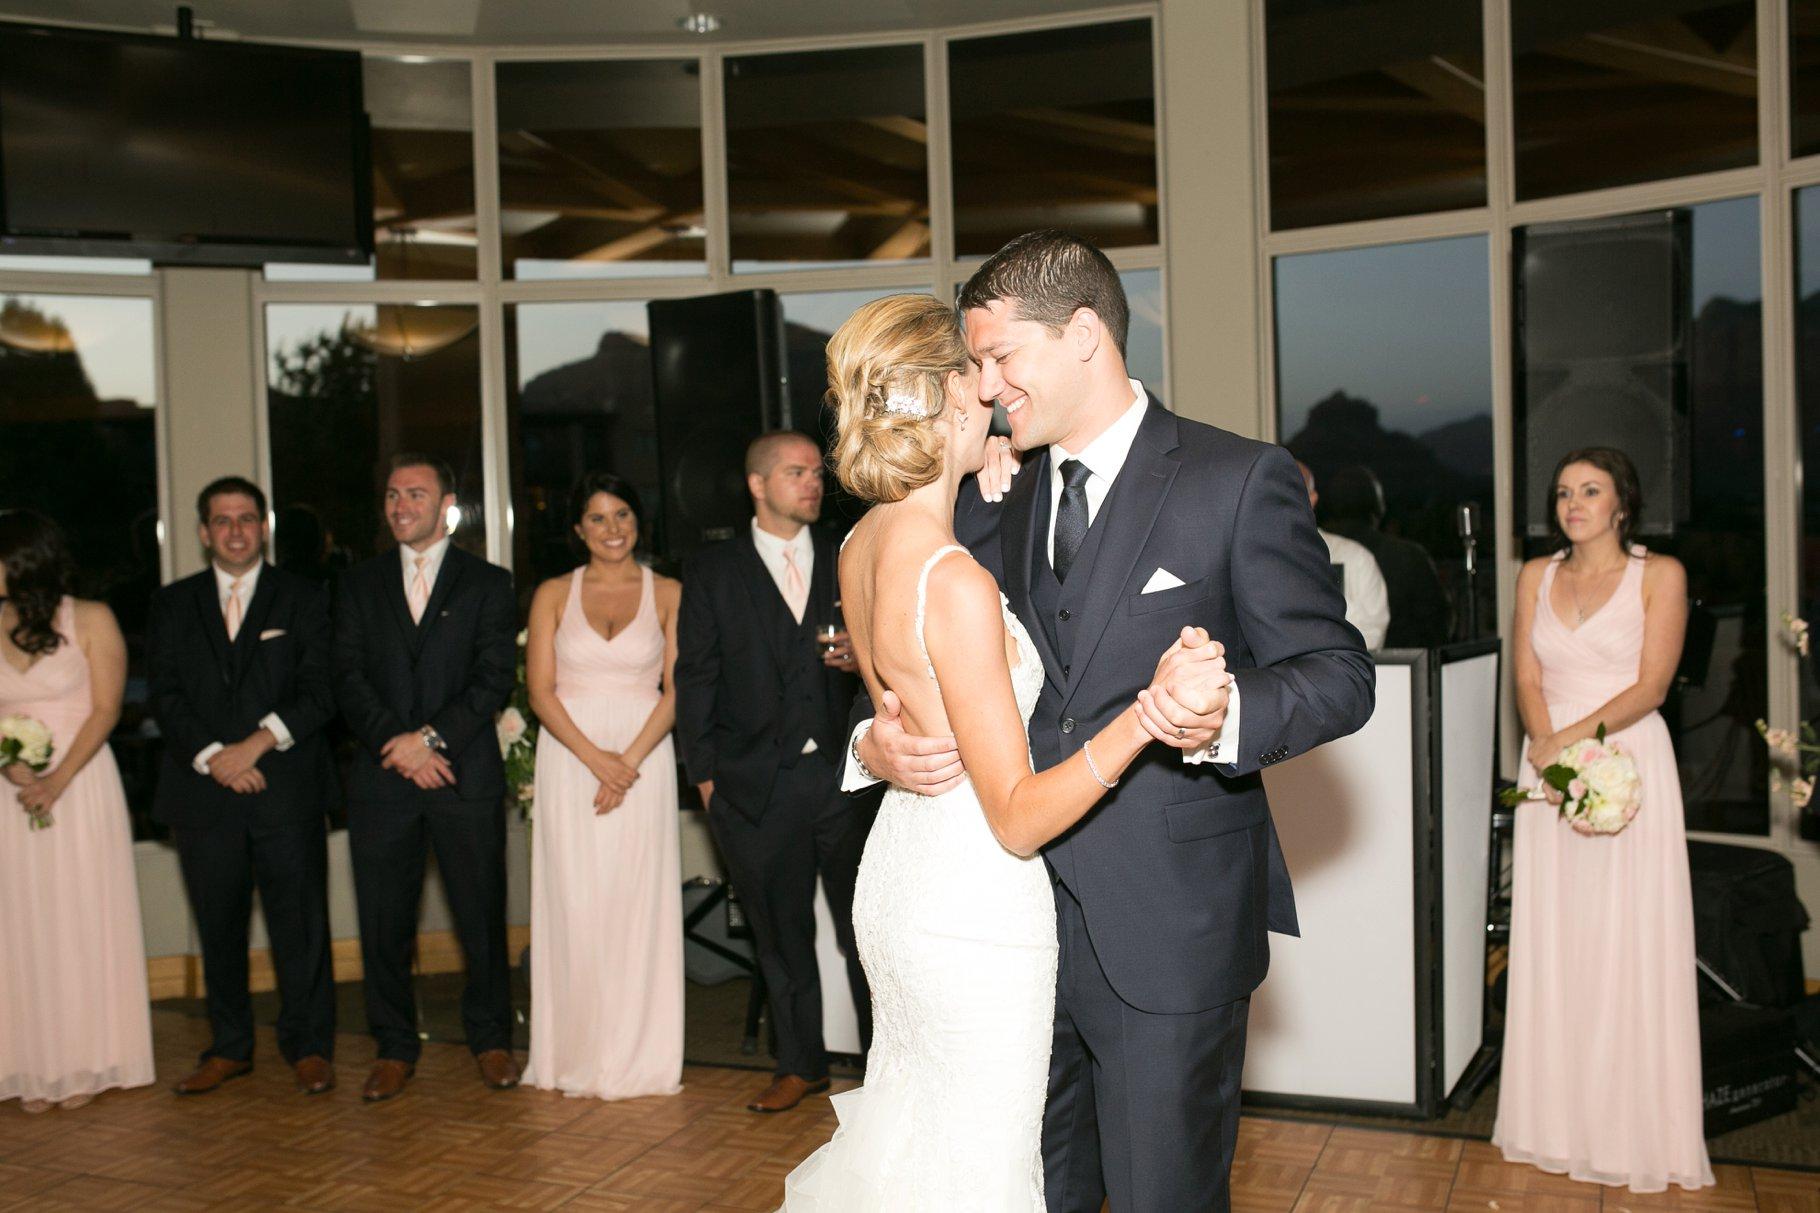 sedona wedding-501_GRETCHEN WAKEMAN PHOTOGRAPHY.jpg